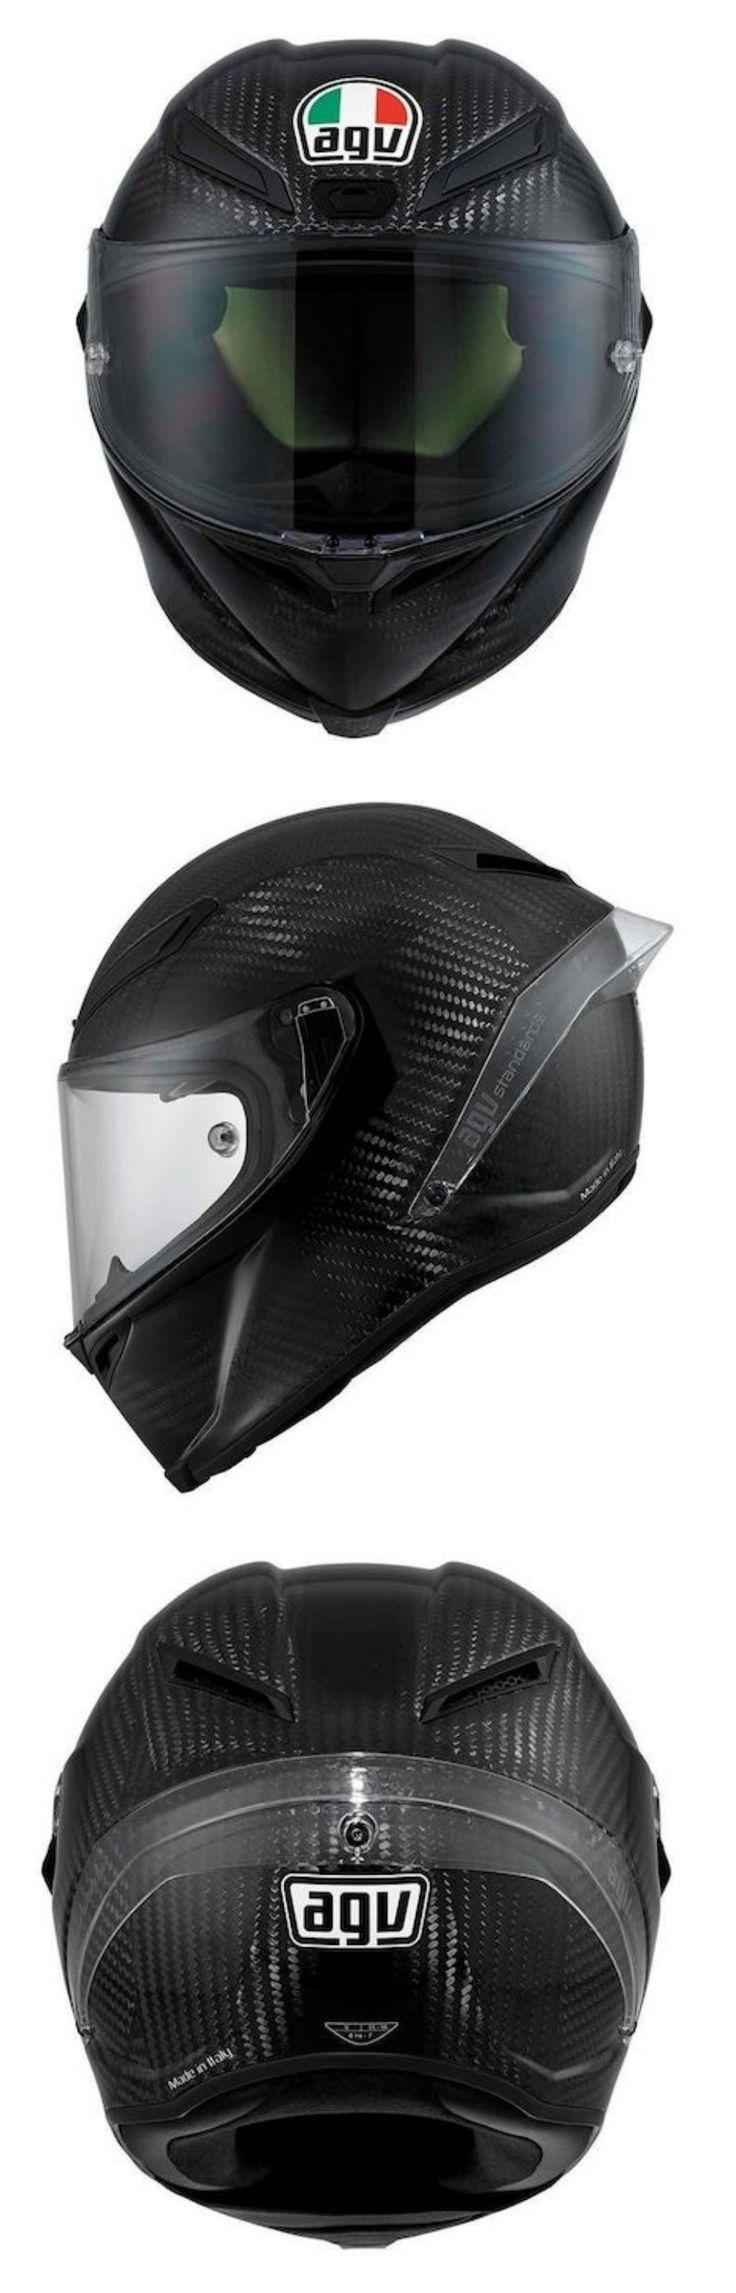 AGV Pista GP Carbon Motorcycle Helmets Tall